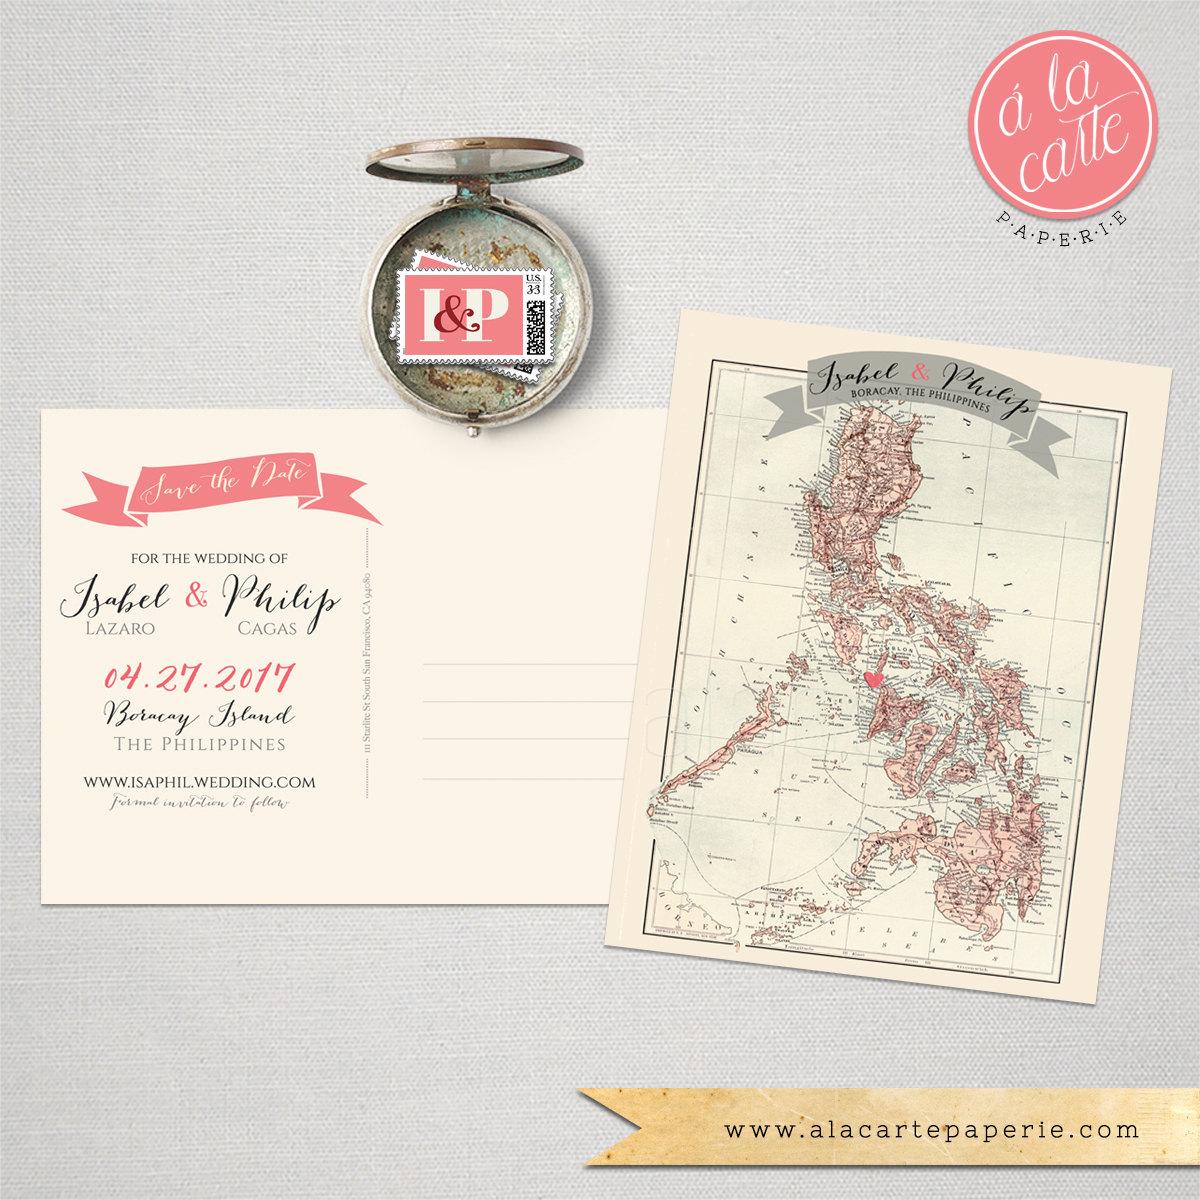 Destination wedding invitation the philippines boracay manila zoom stopboris Gallery